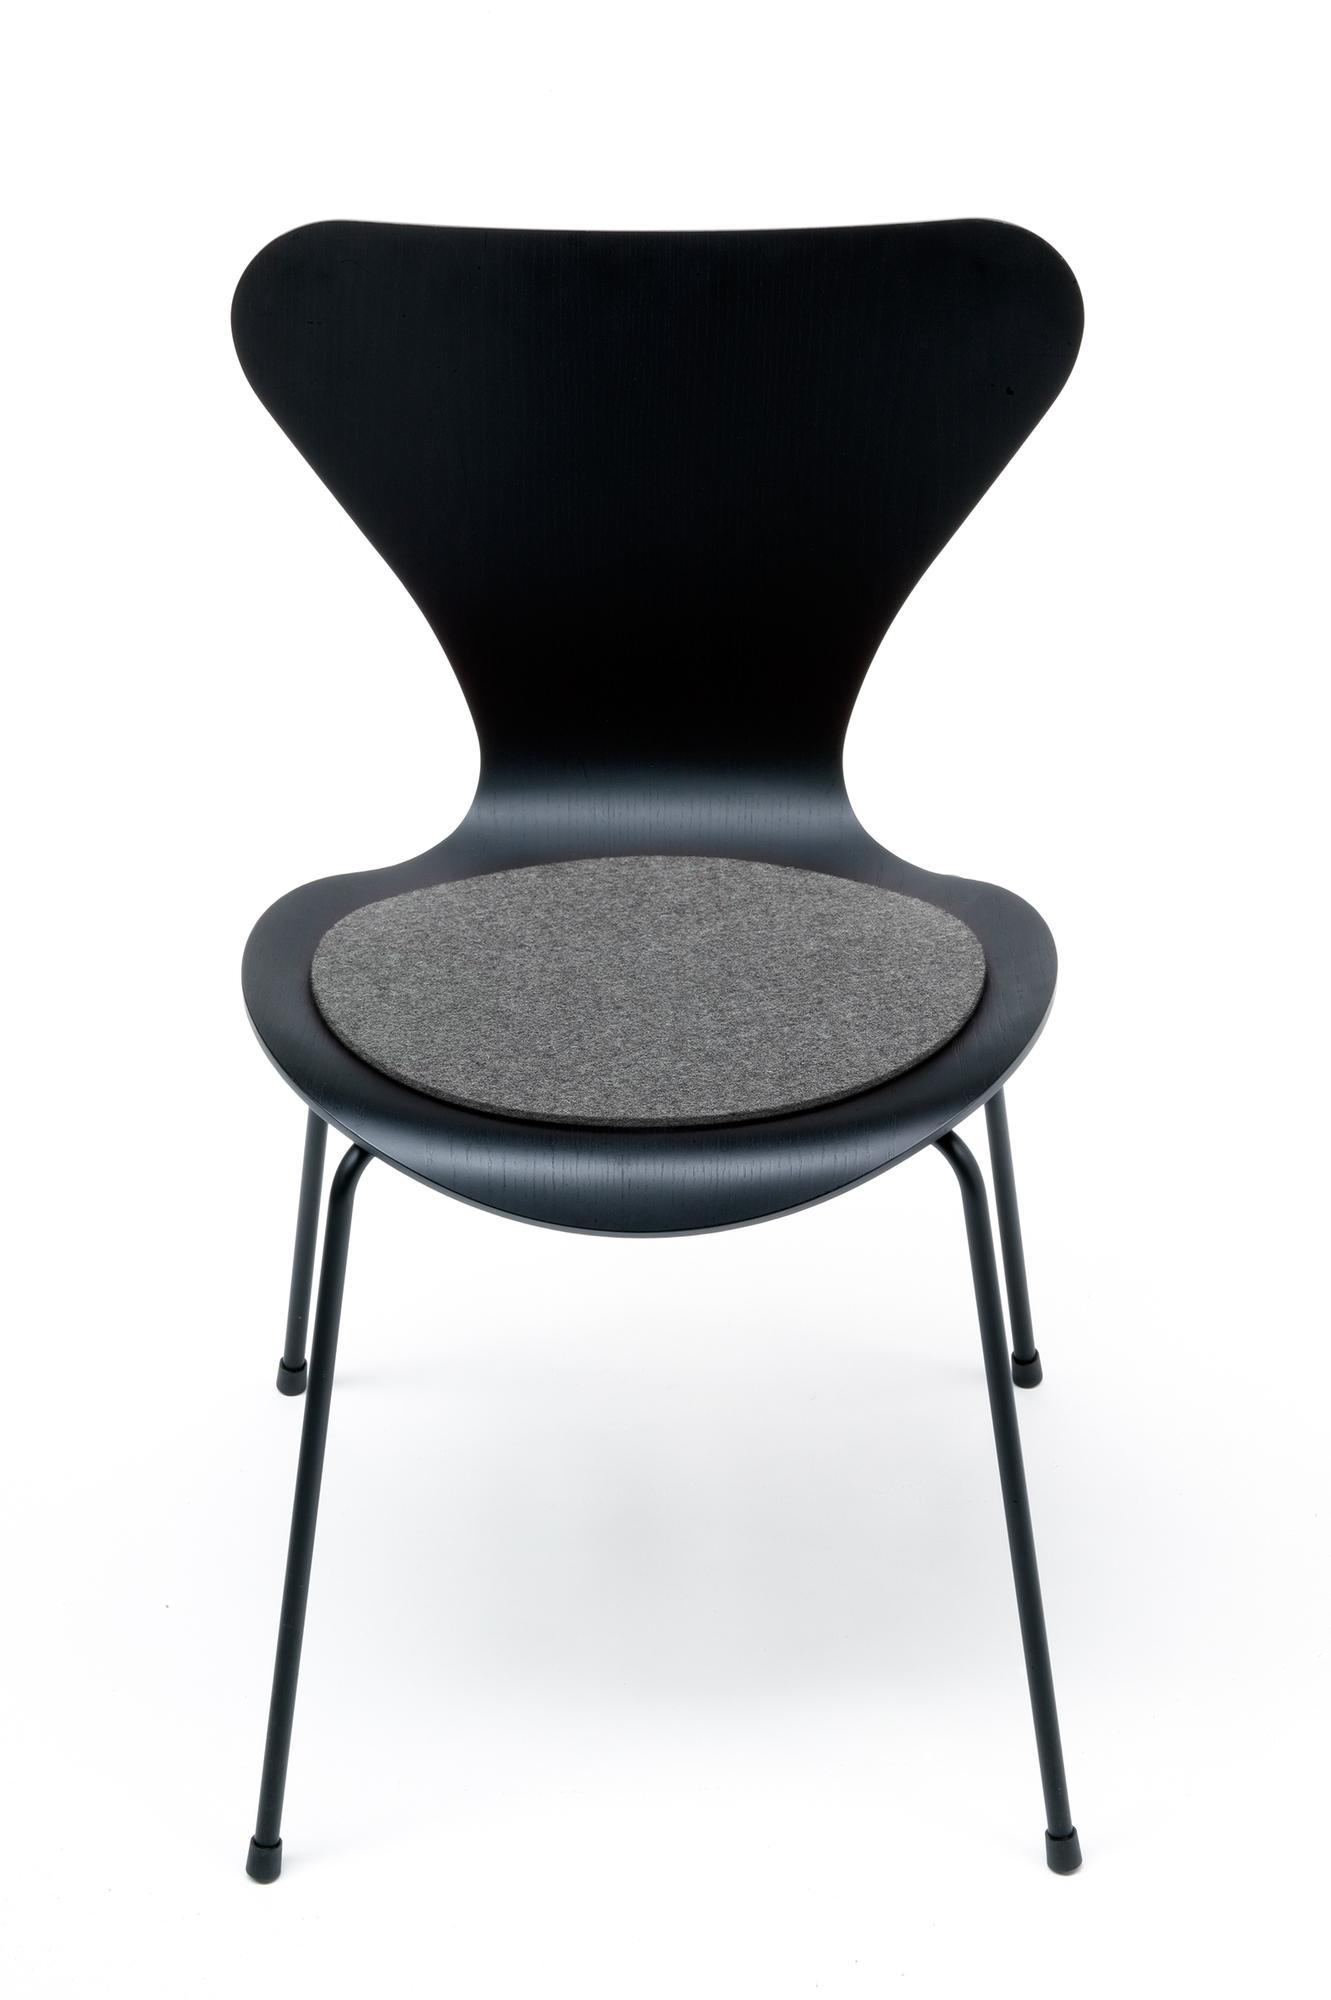 Seat pad - Felt pad Fritz Hansen 3107 Chair Hey Sign